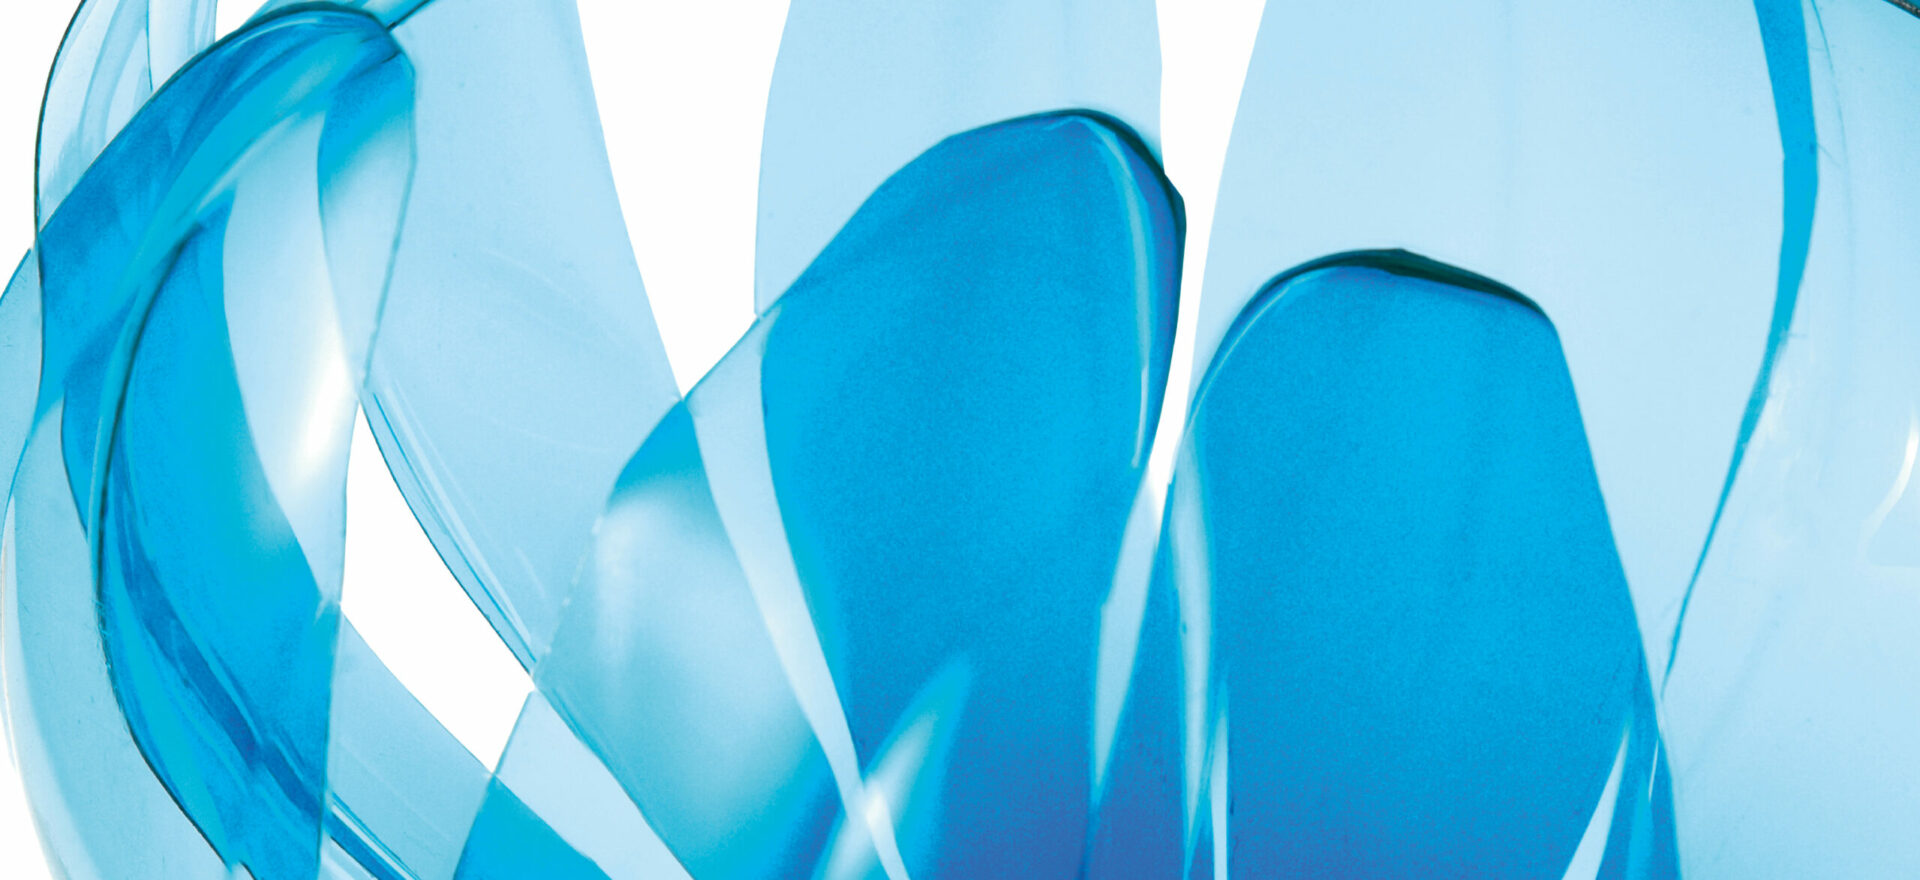 Art Direction | Graphic design | Branding | A2A | Mario Trimarchi Design | Fragile